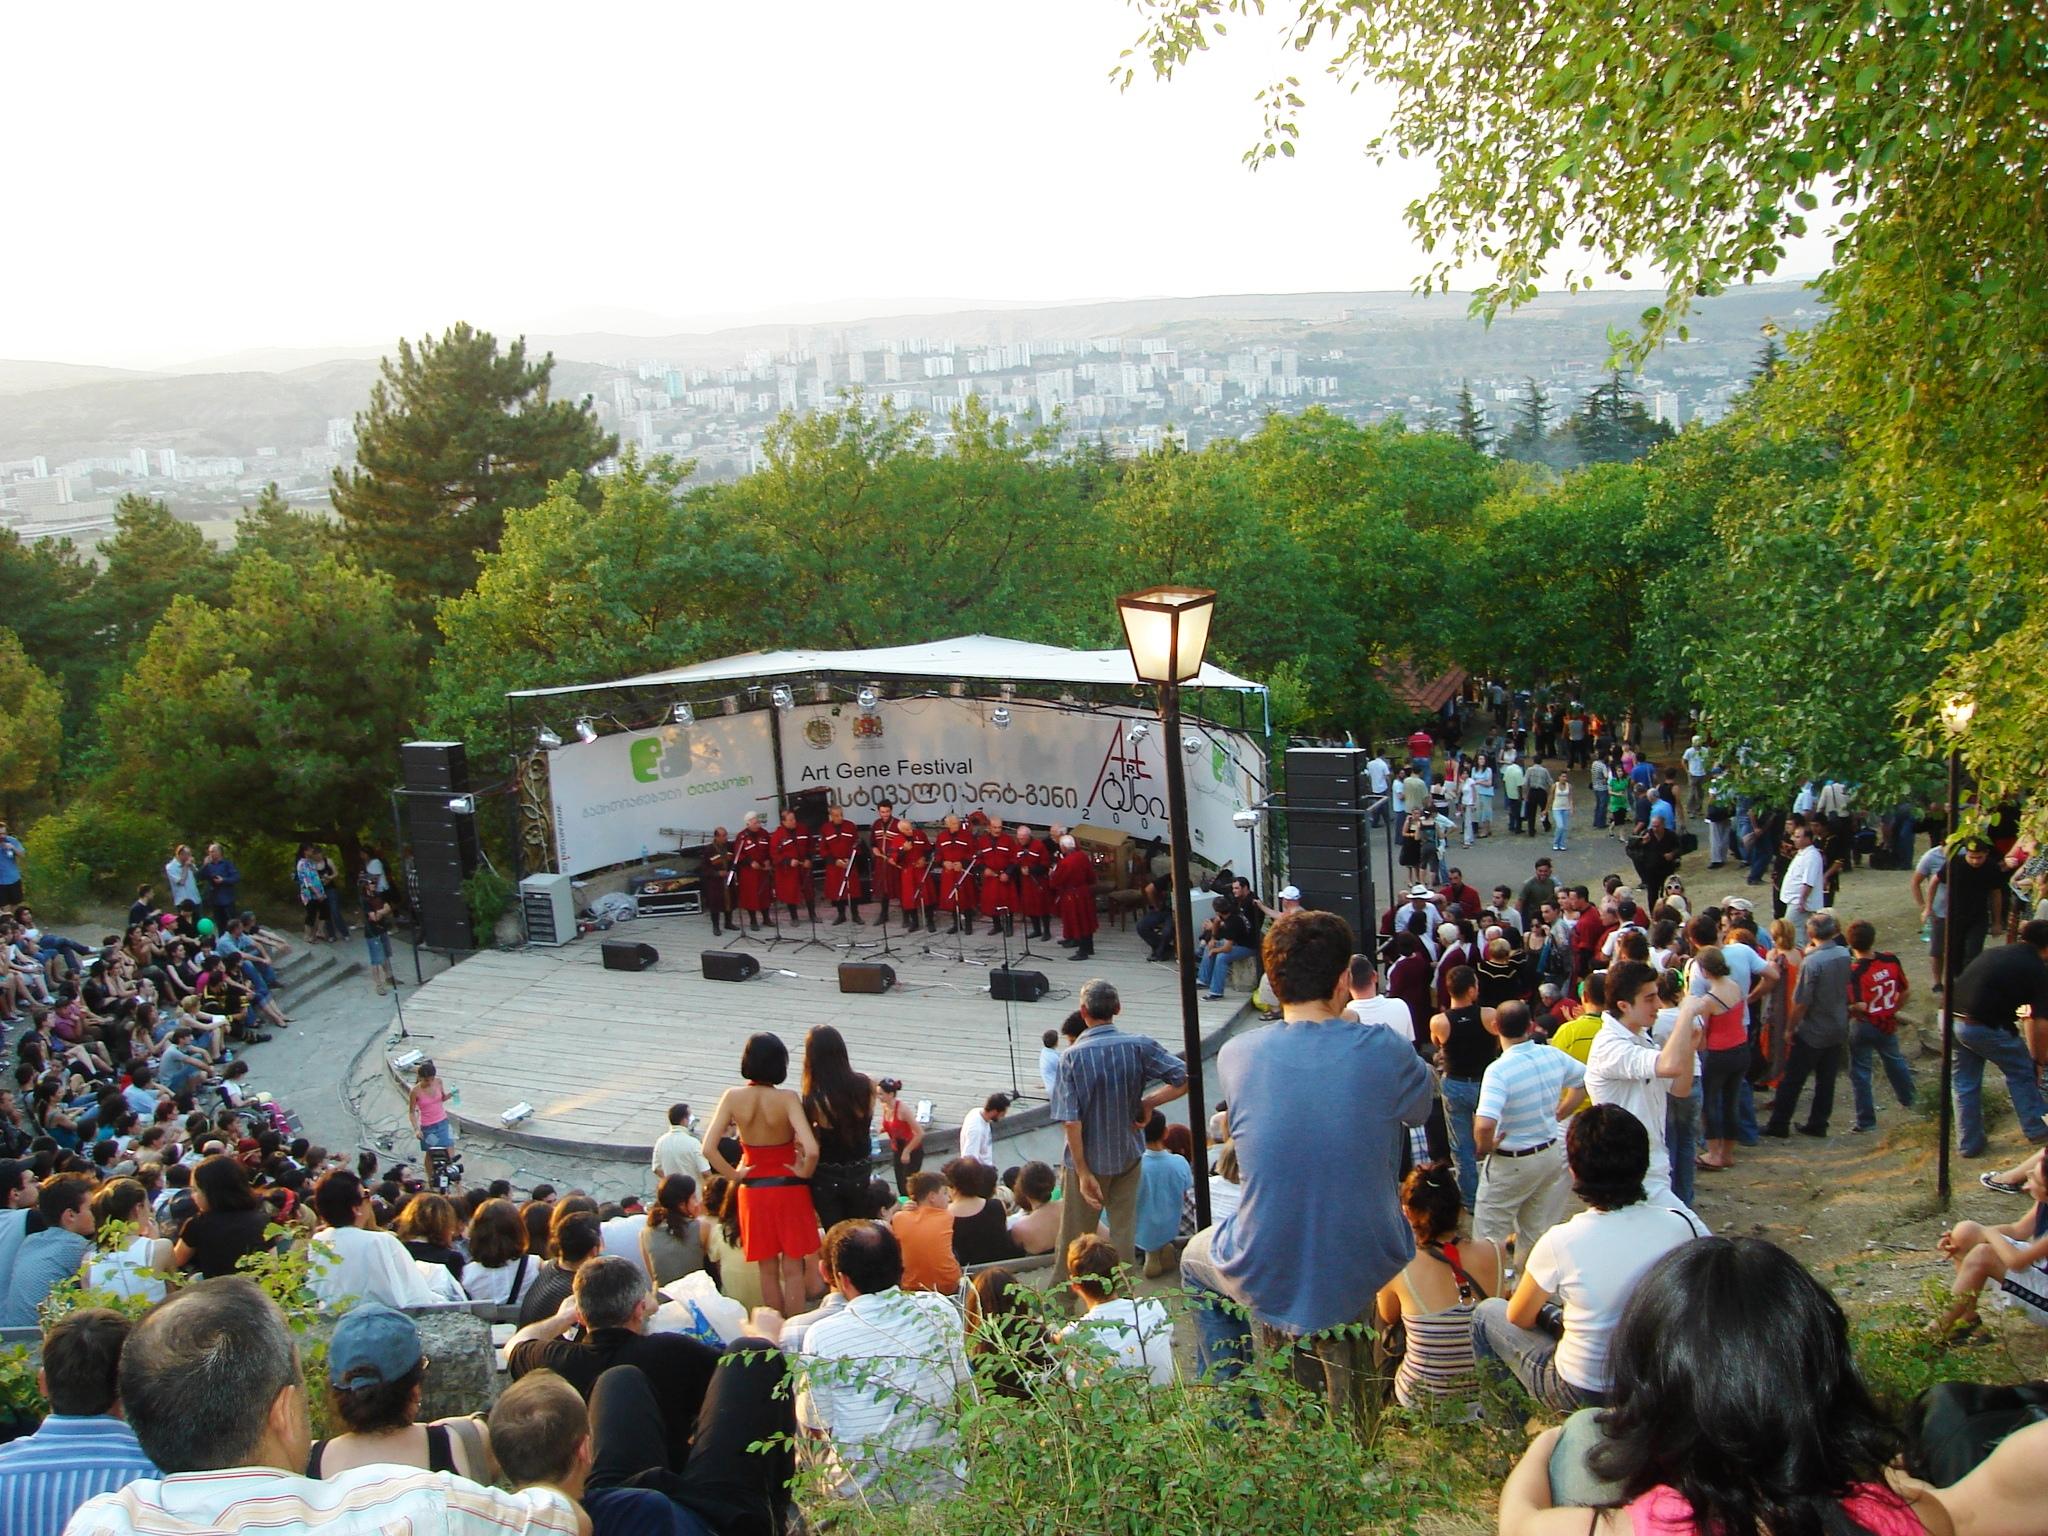 Art-Gene Festival: Traditional Festivals Unique to Georgia